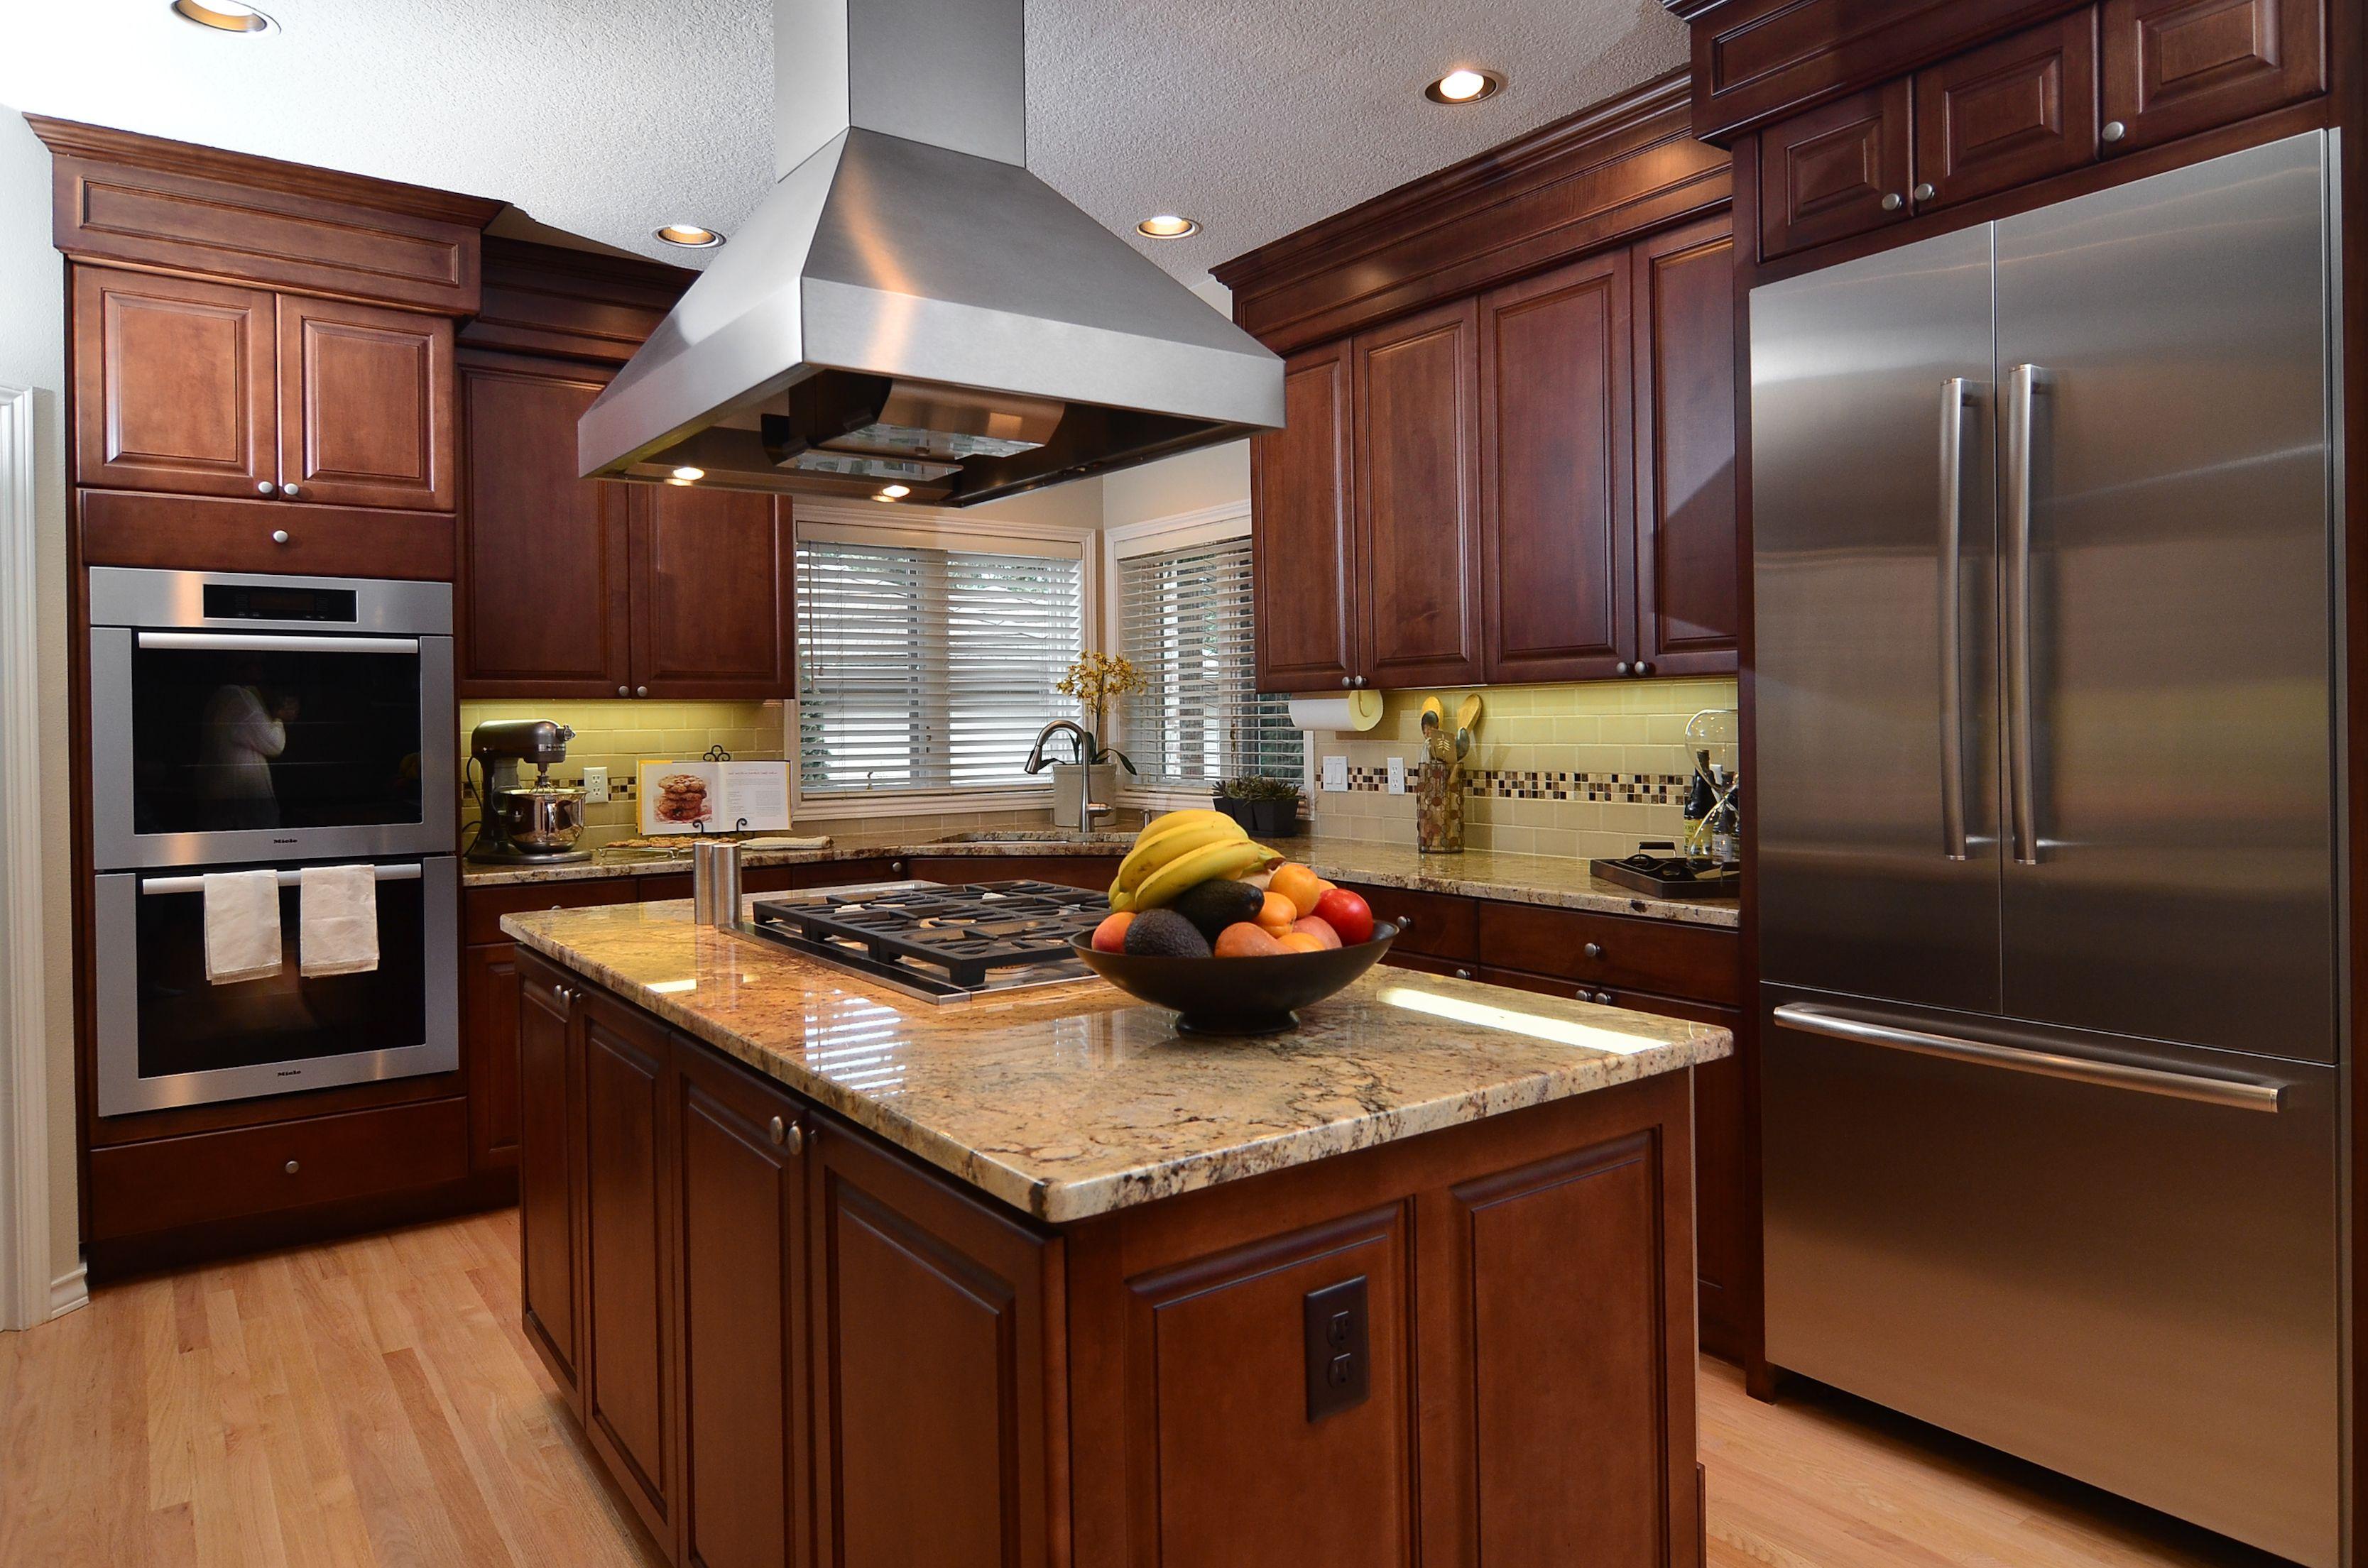 Maple Nutmeg Cabinets | Cabinets Matttroy